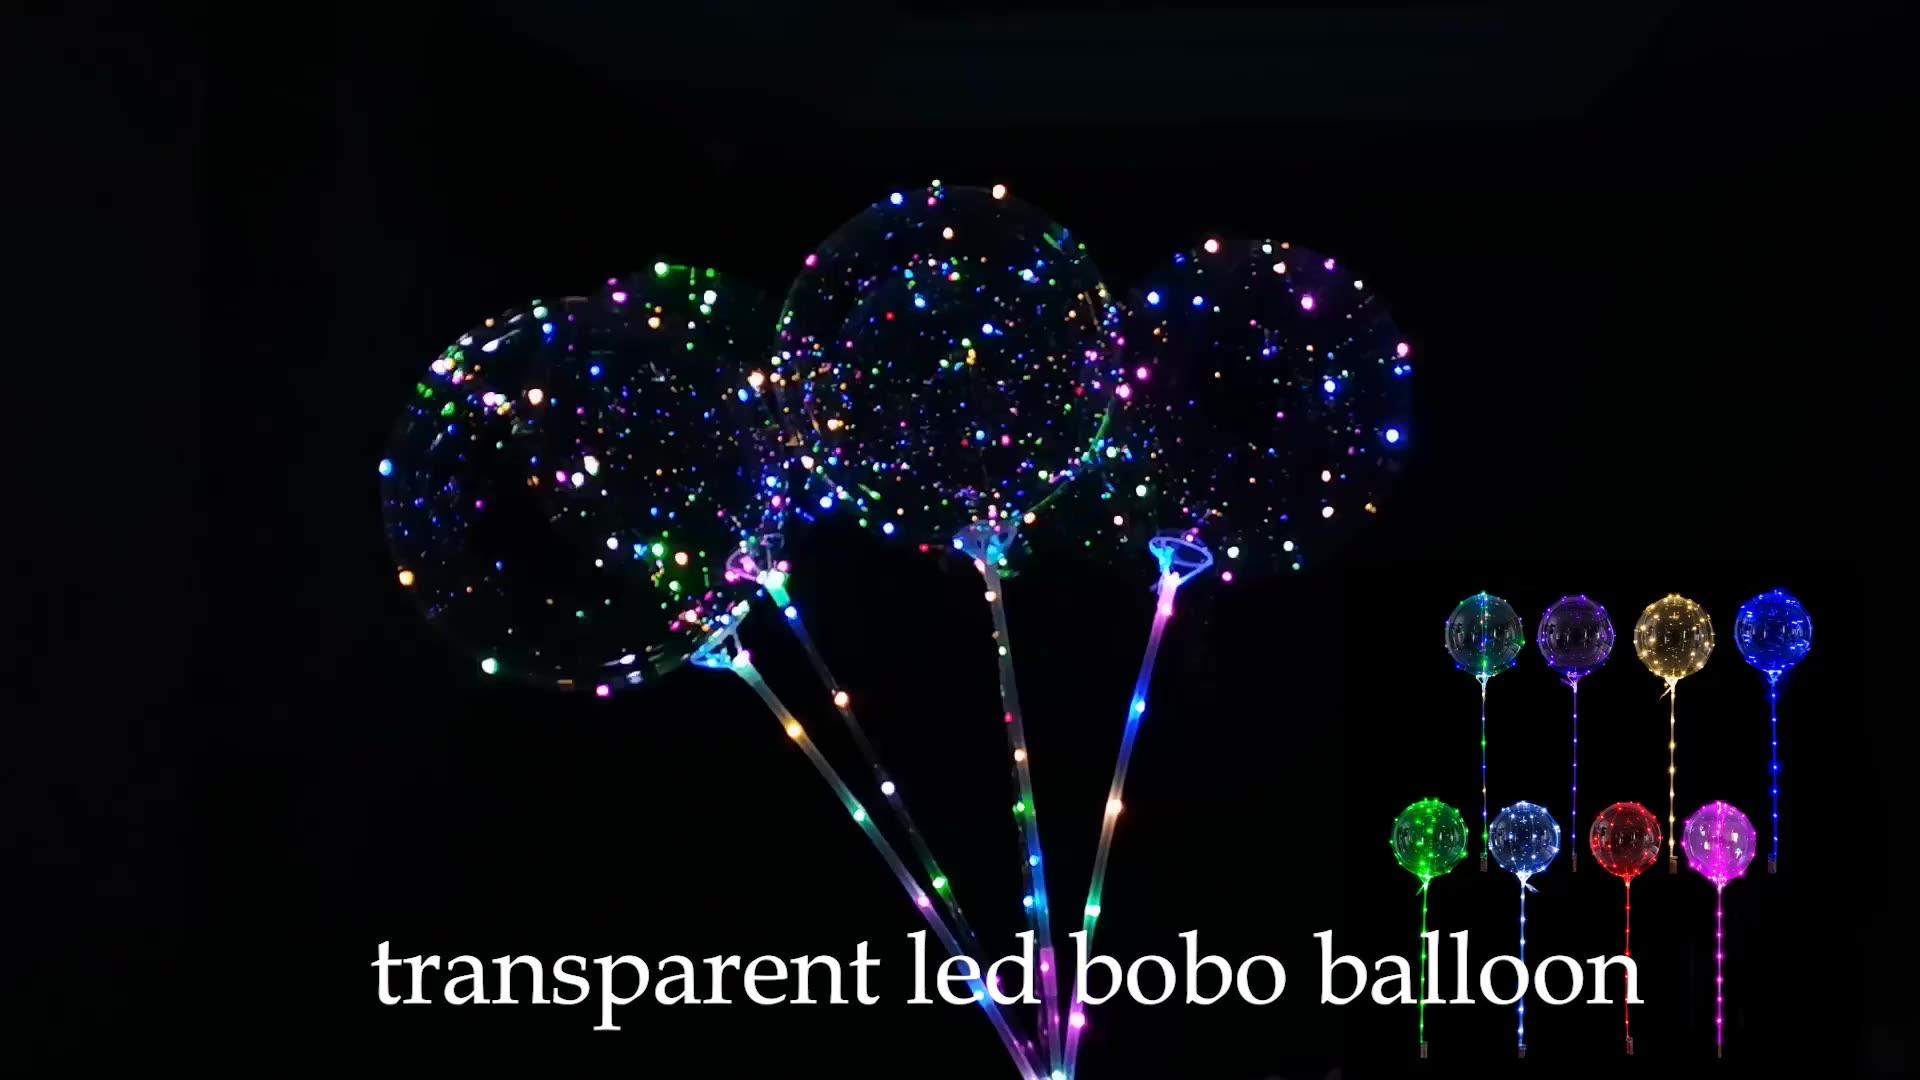 Toptan PVC Plastik led ışık Parlayan Balon Şeffaf Şeffaf Kabarcık Balon